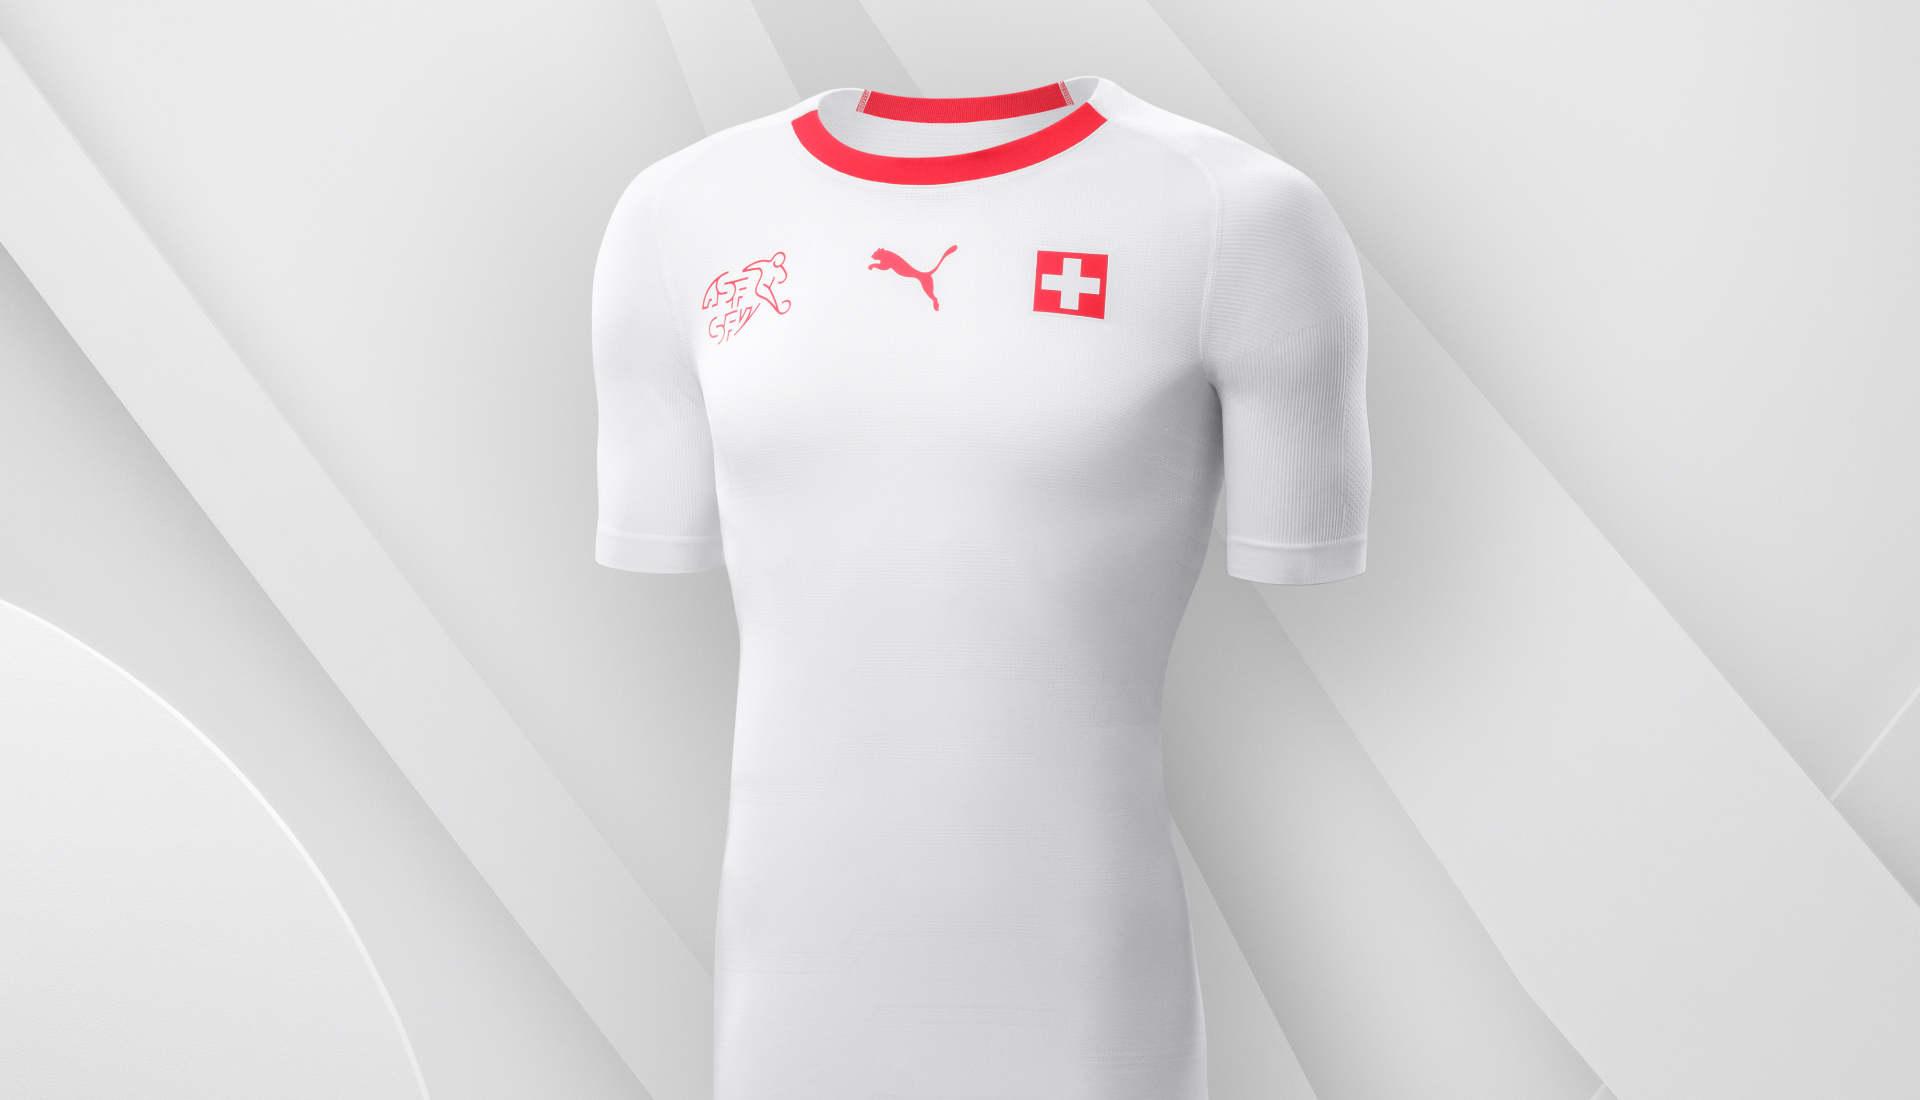 2d1114fc5 PUMA Reveal 2018 Federation Away Shirts - SoccerBible.